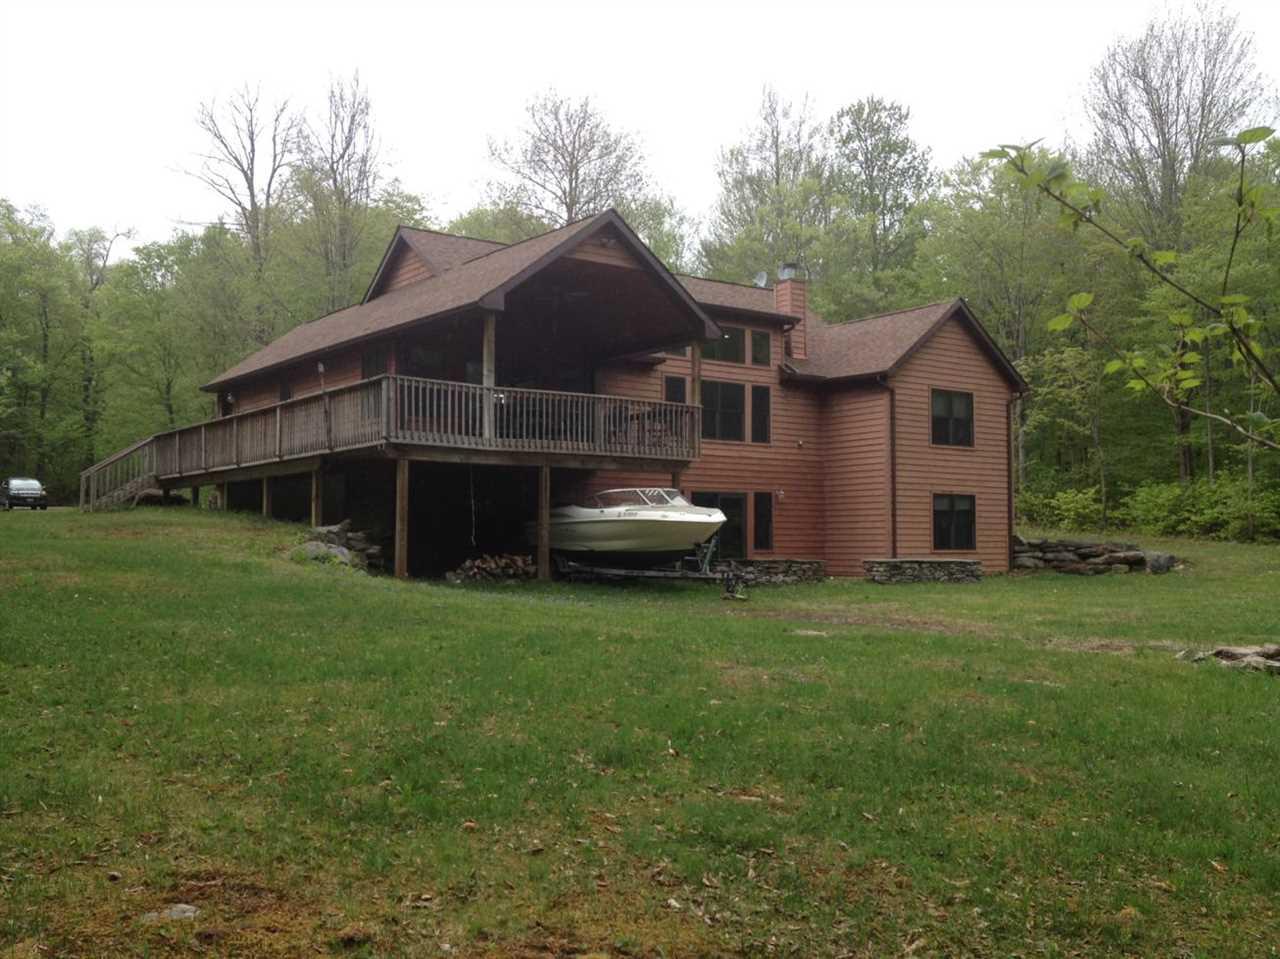 Real Estate for Sale, ListingId: 32558522, Roscoe,NY12776